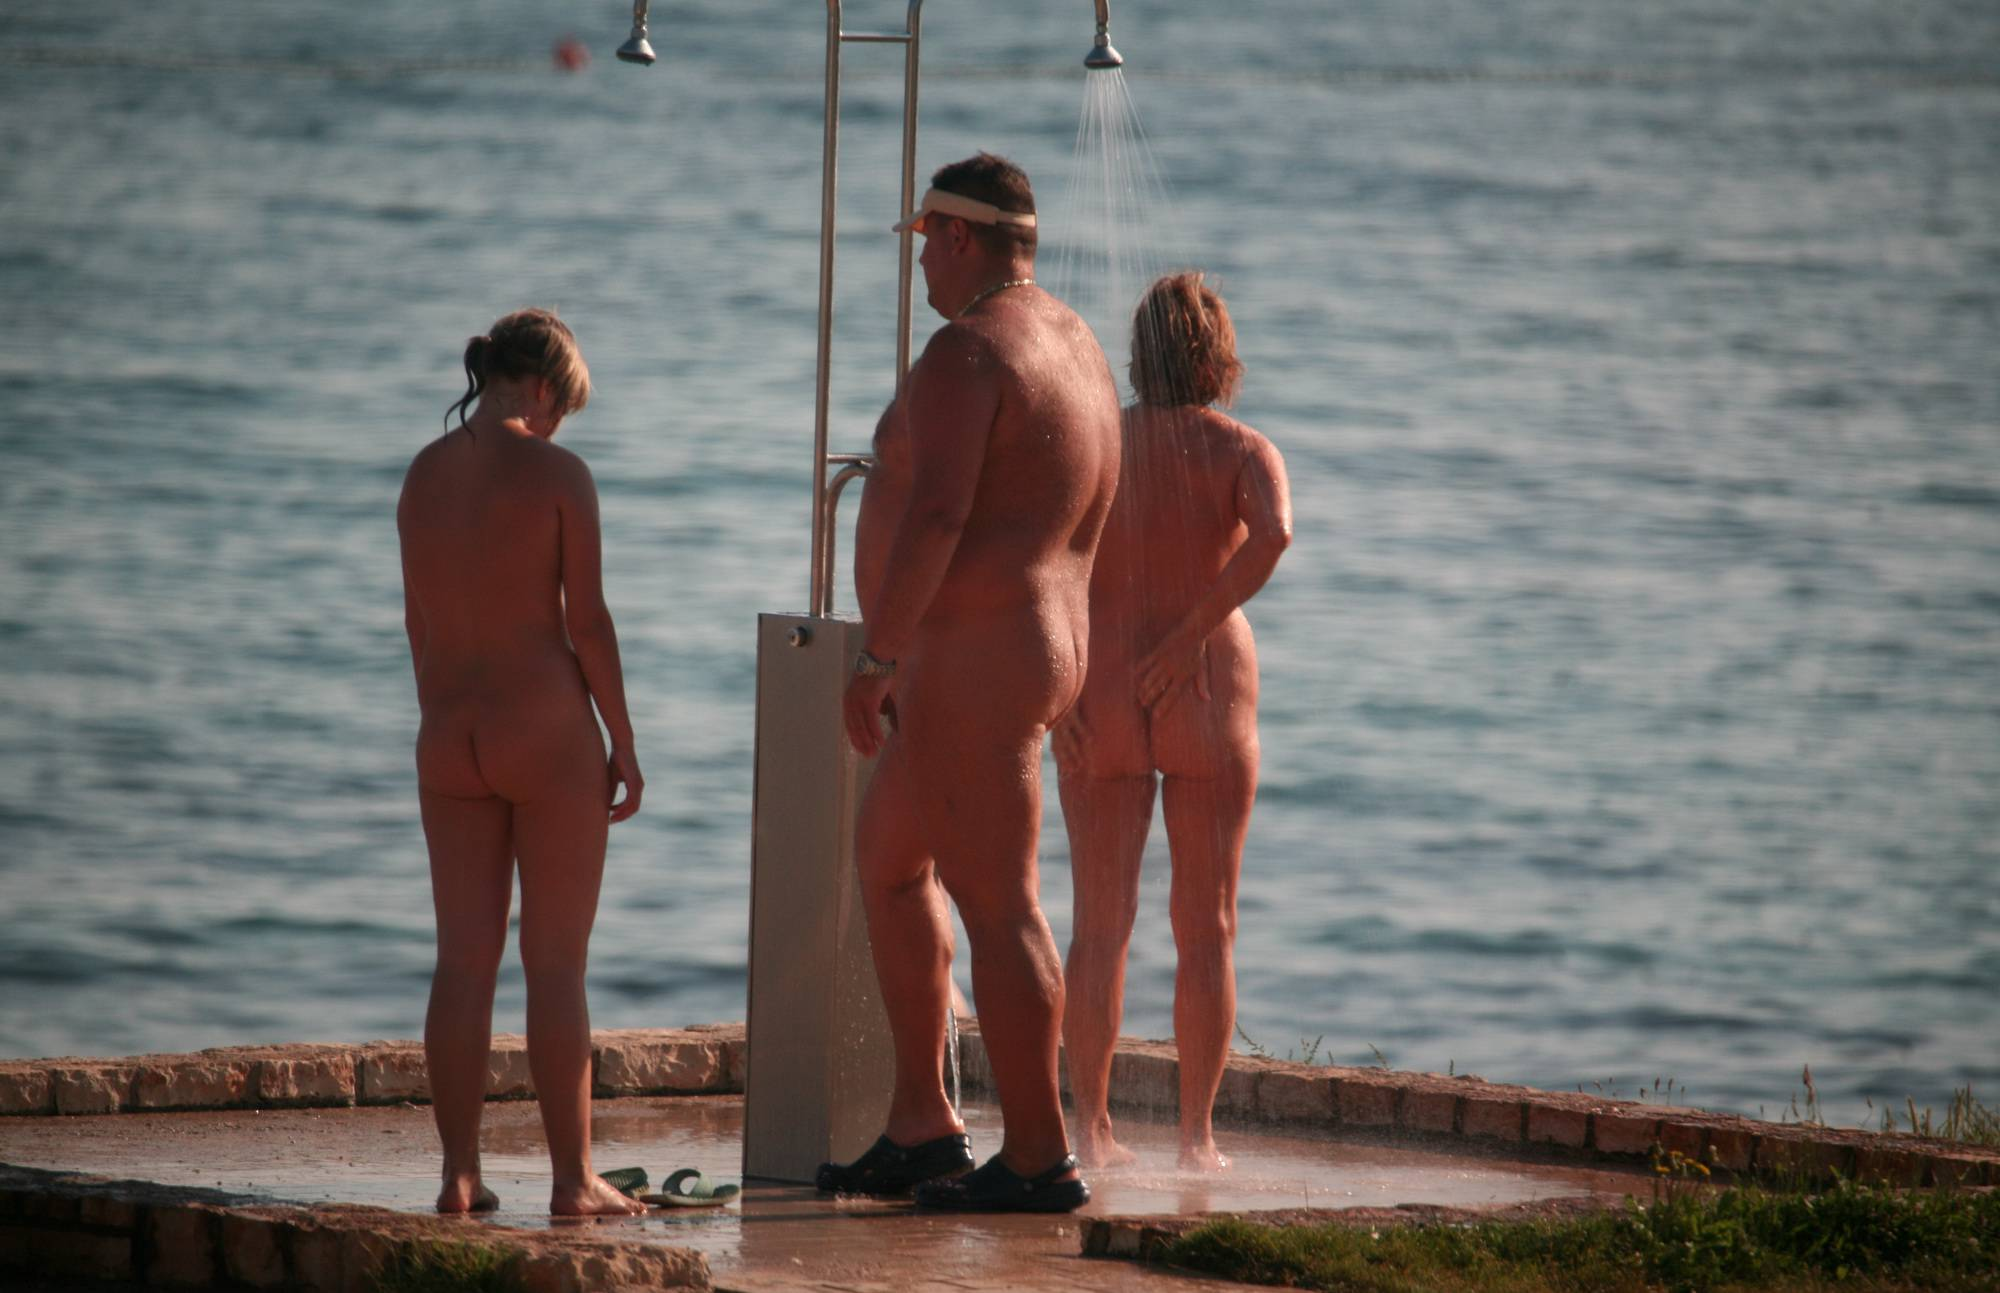 Nudist Pictures Naturist Shower at Dusk - 2